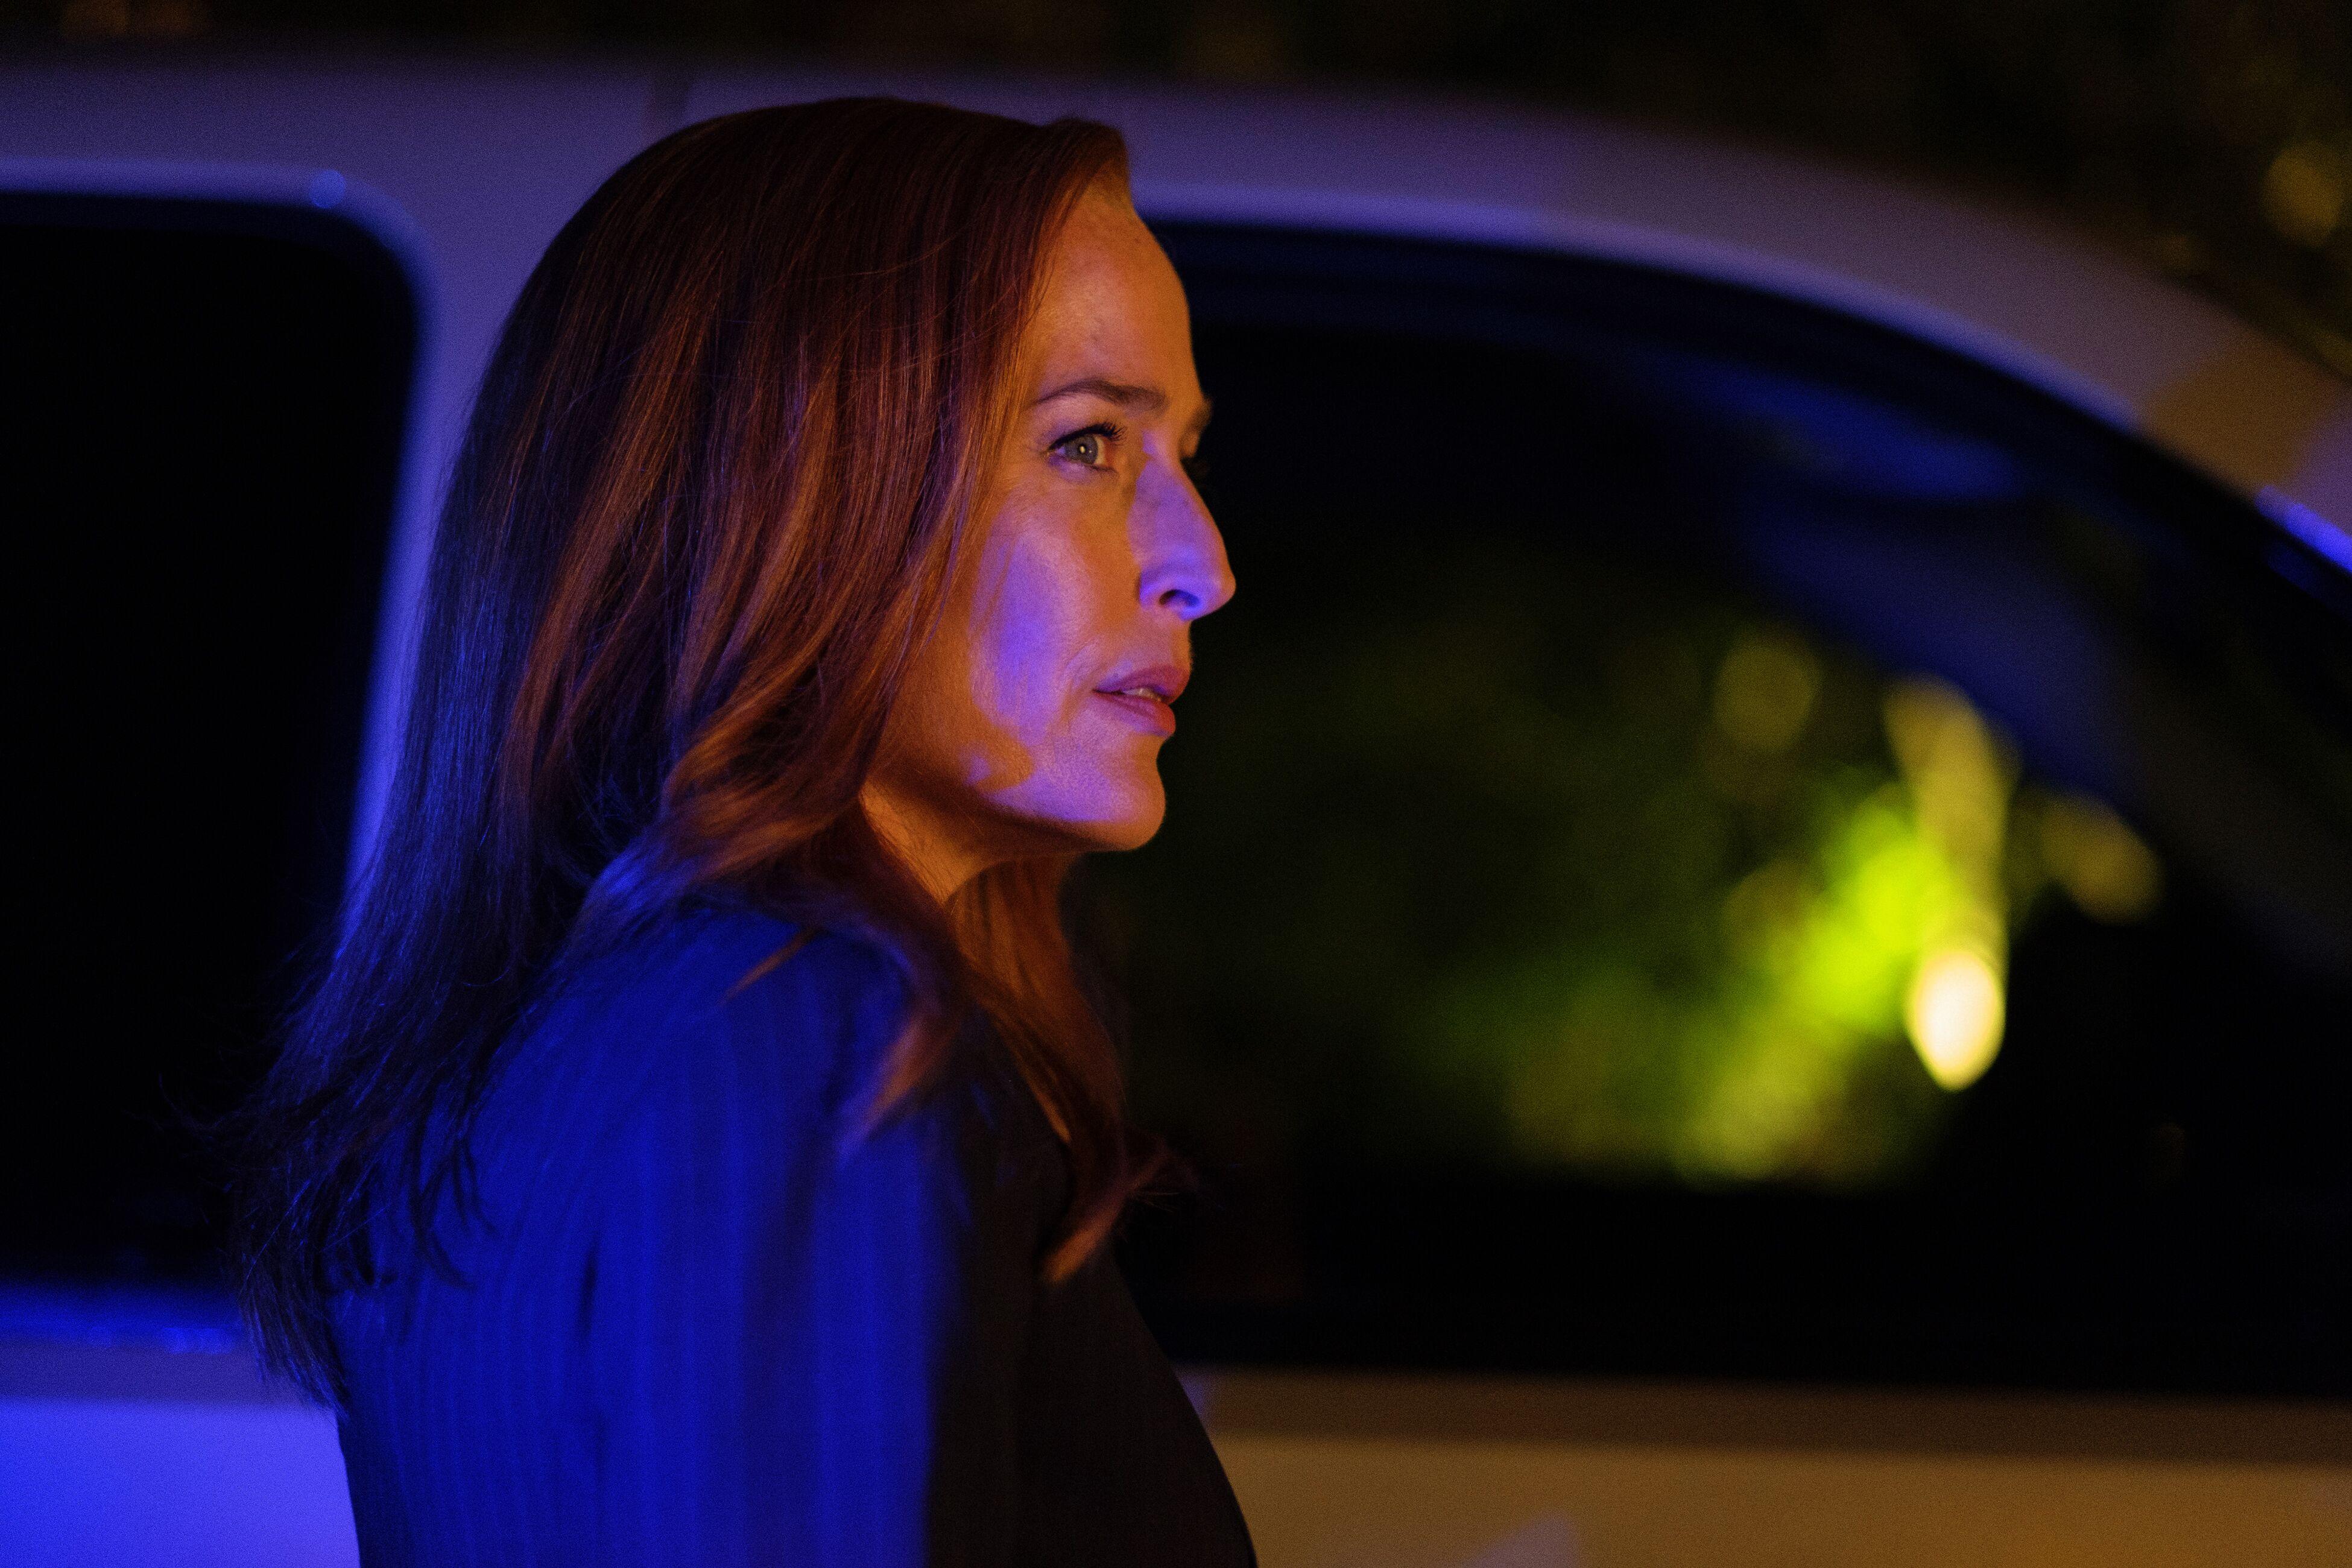 Women to Admire: Dana Scully